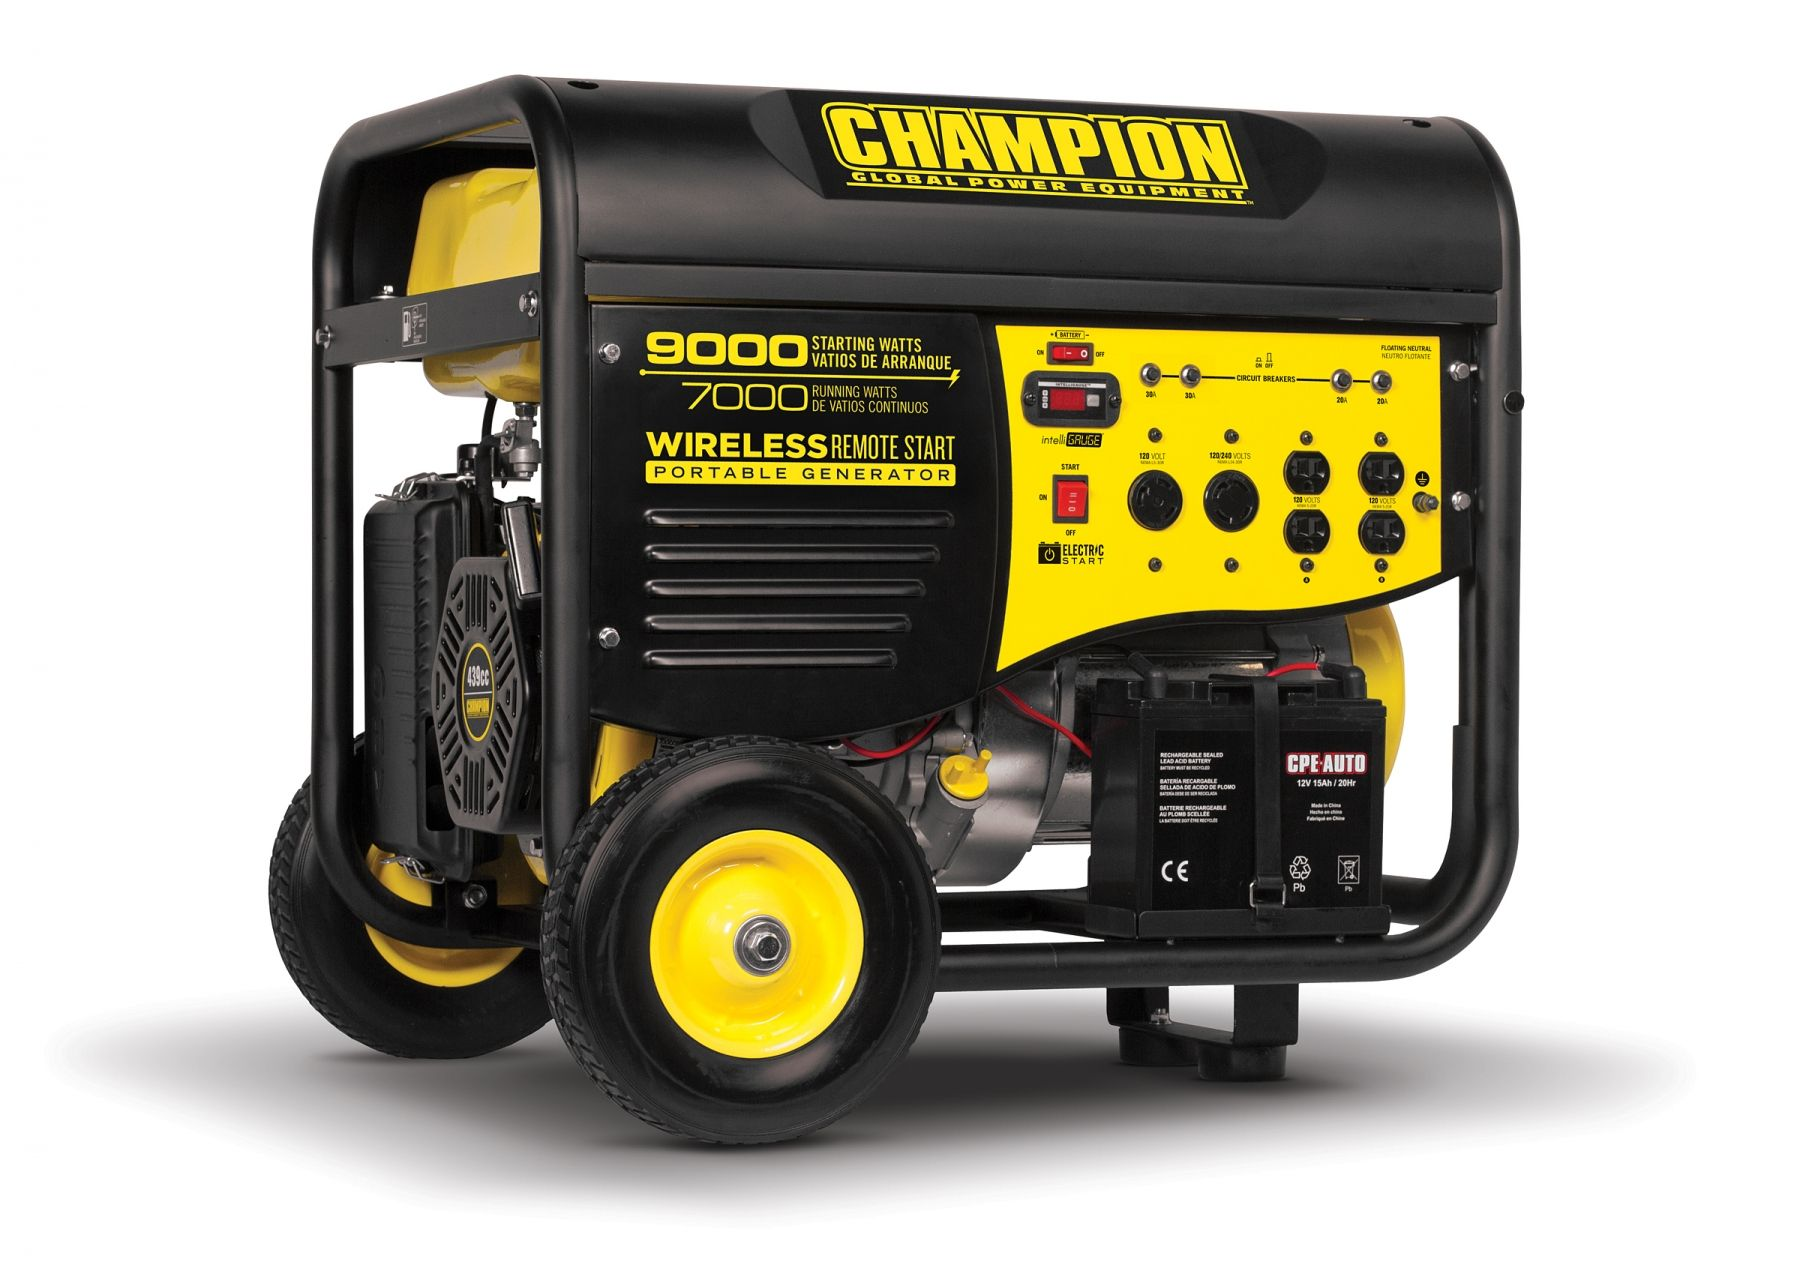 41532r refurbished 70009000w generator remote start